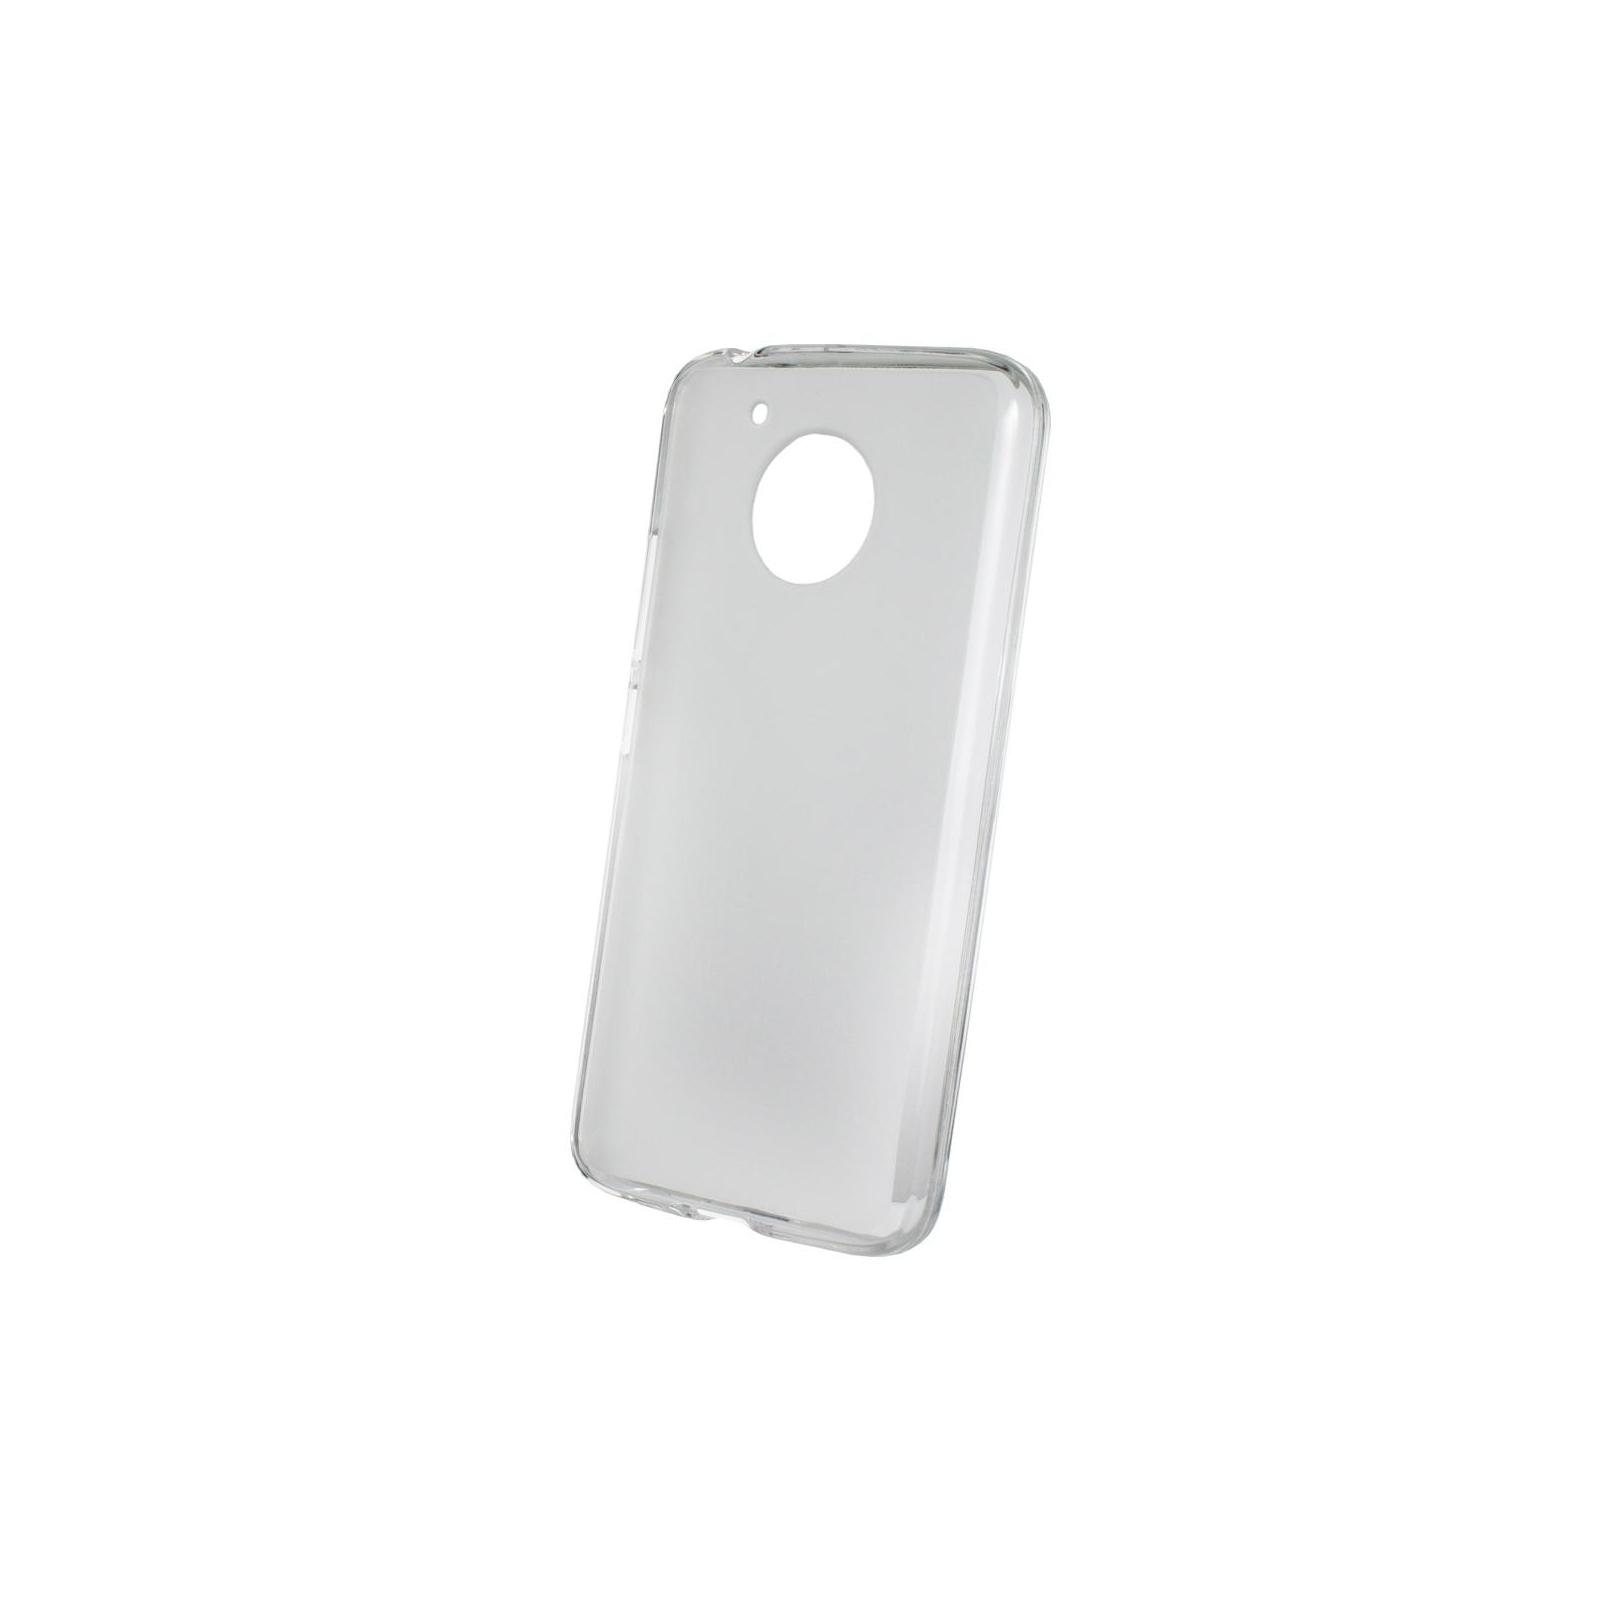 Чехол для моб. телефона Colorway TPU case for Motorola MOTO G5 Plus (XT1685) (CW-CTBMMG5P) изображение 2